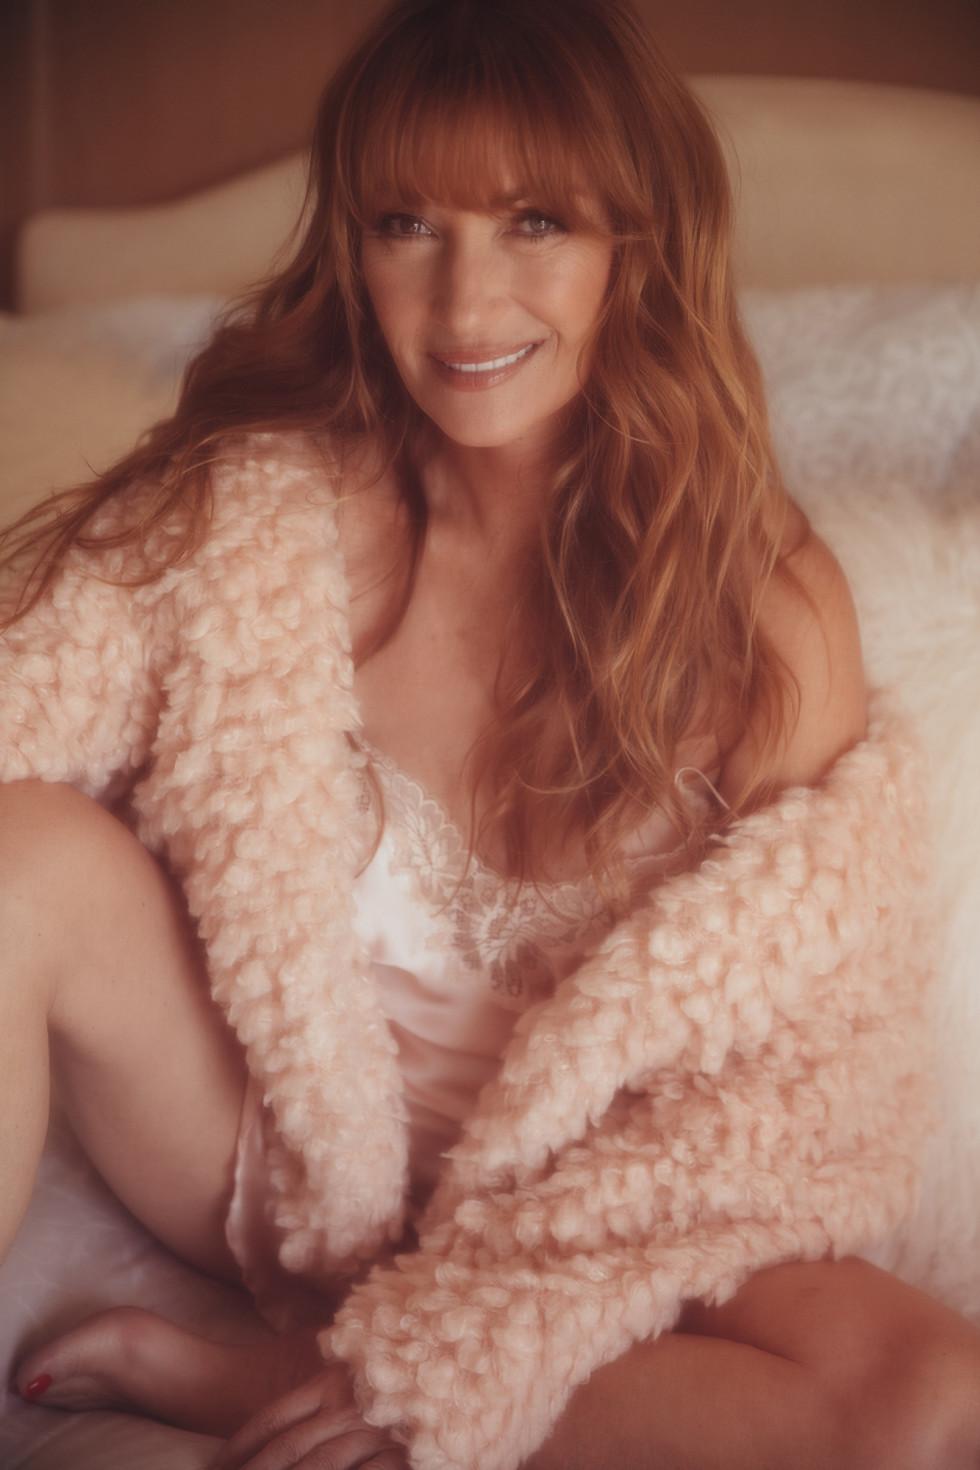 Sex symbol dos anos 1970, Jane Seymour volta a posar para a Playboy aos 67 anos